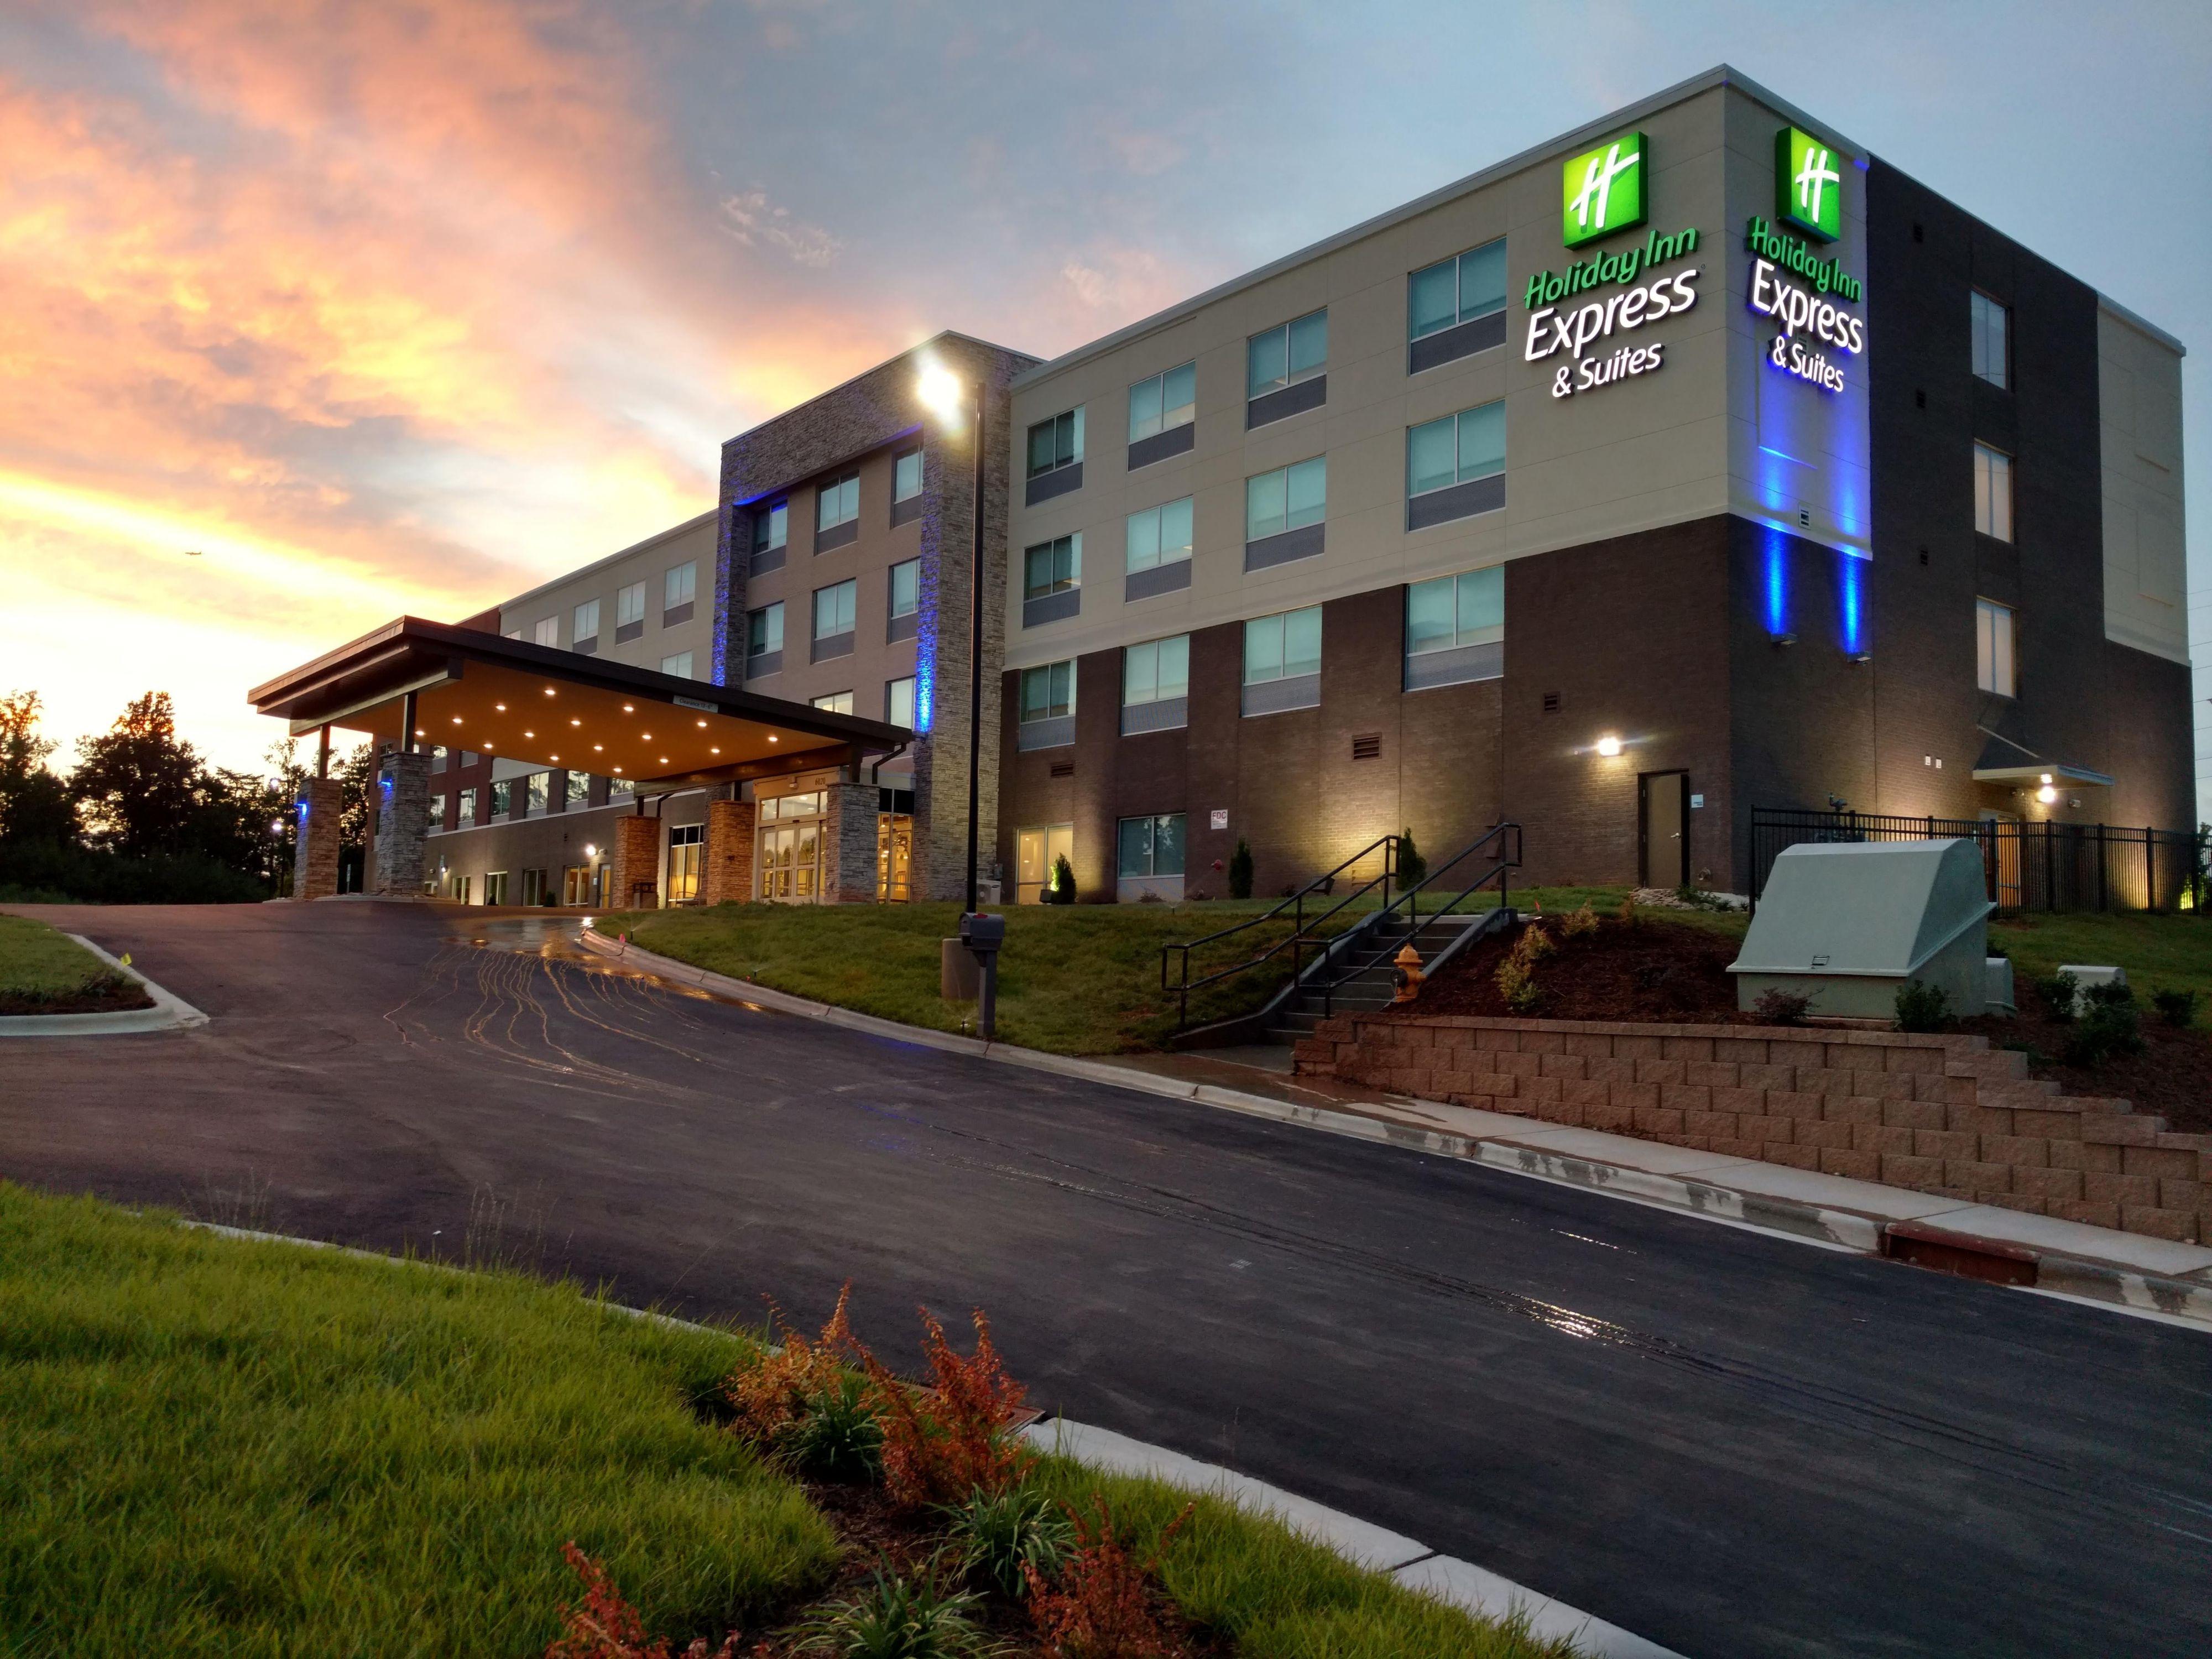 Hotels near Charlotte, NC Airport | Holiday Inn Express & Suites Charlotte NE - University Area